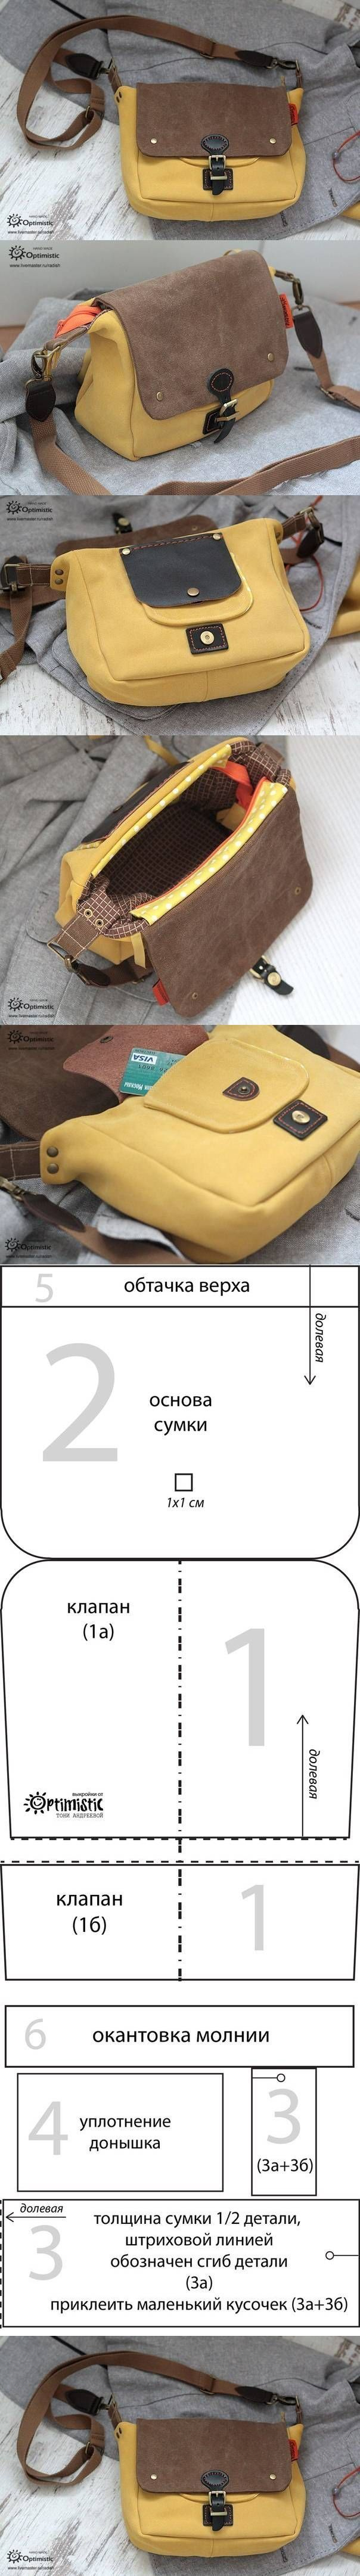 DIY Sew Handbag Pattern DIY Projects | UsefulDIY.com Follow us on Facebook ==> https://www.facebook.com/UsefulDiy - ladies handbags and purses, vintage designer handbags, handbags with price *sponsored https://www.pinterest.com/purses_handbags/ https://www.pinterest.com/explore/handbag/ https://www.pinterest.com/purses_handbags/handbags/ http://www.chanel.com/en_US/fashion/products/handbags/g.fall-winter-2016-17-pre-collection.c.16B.html